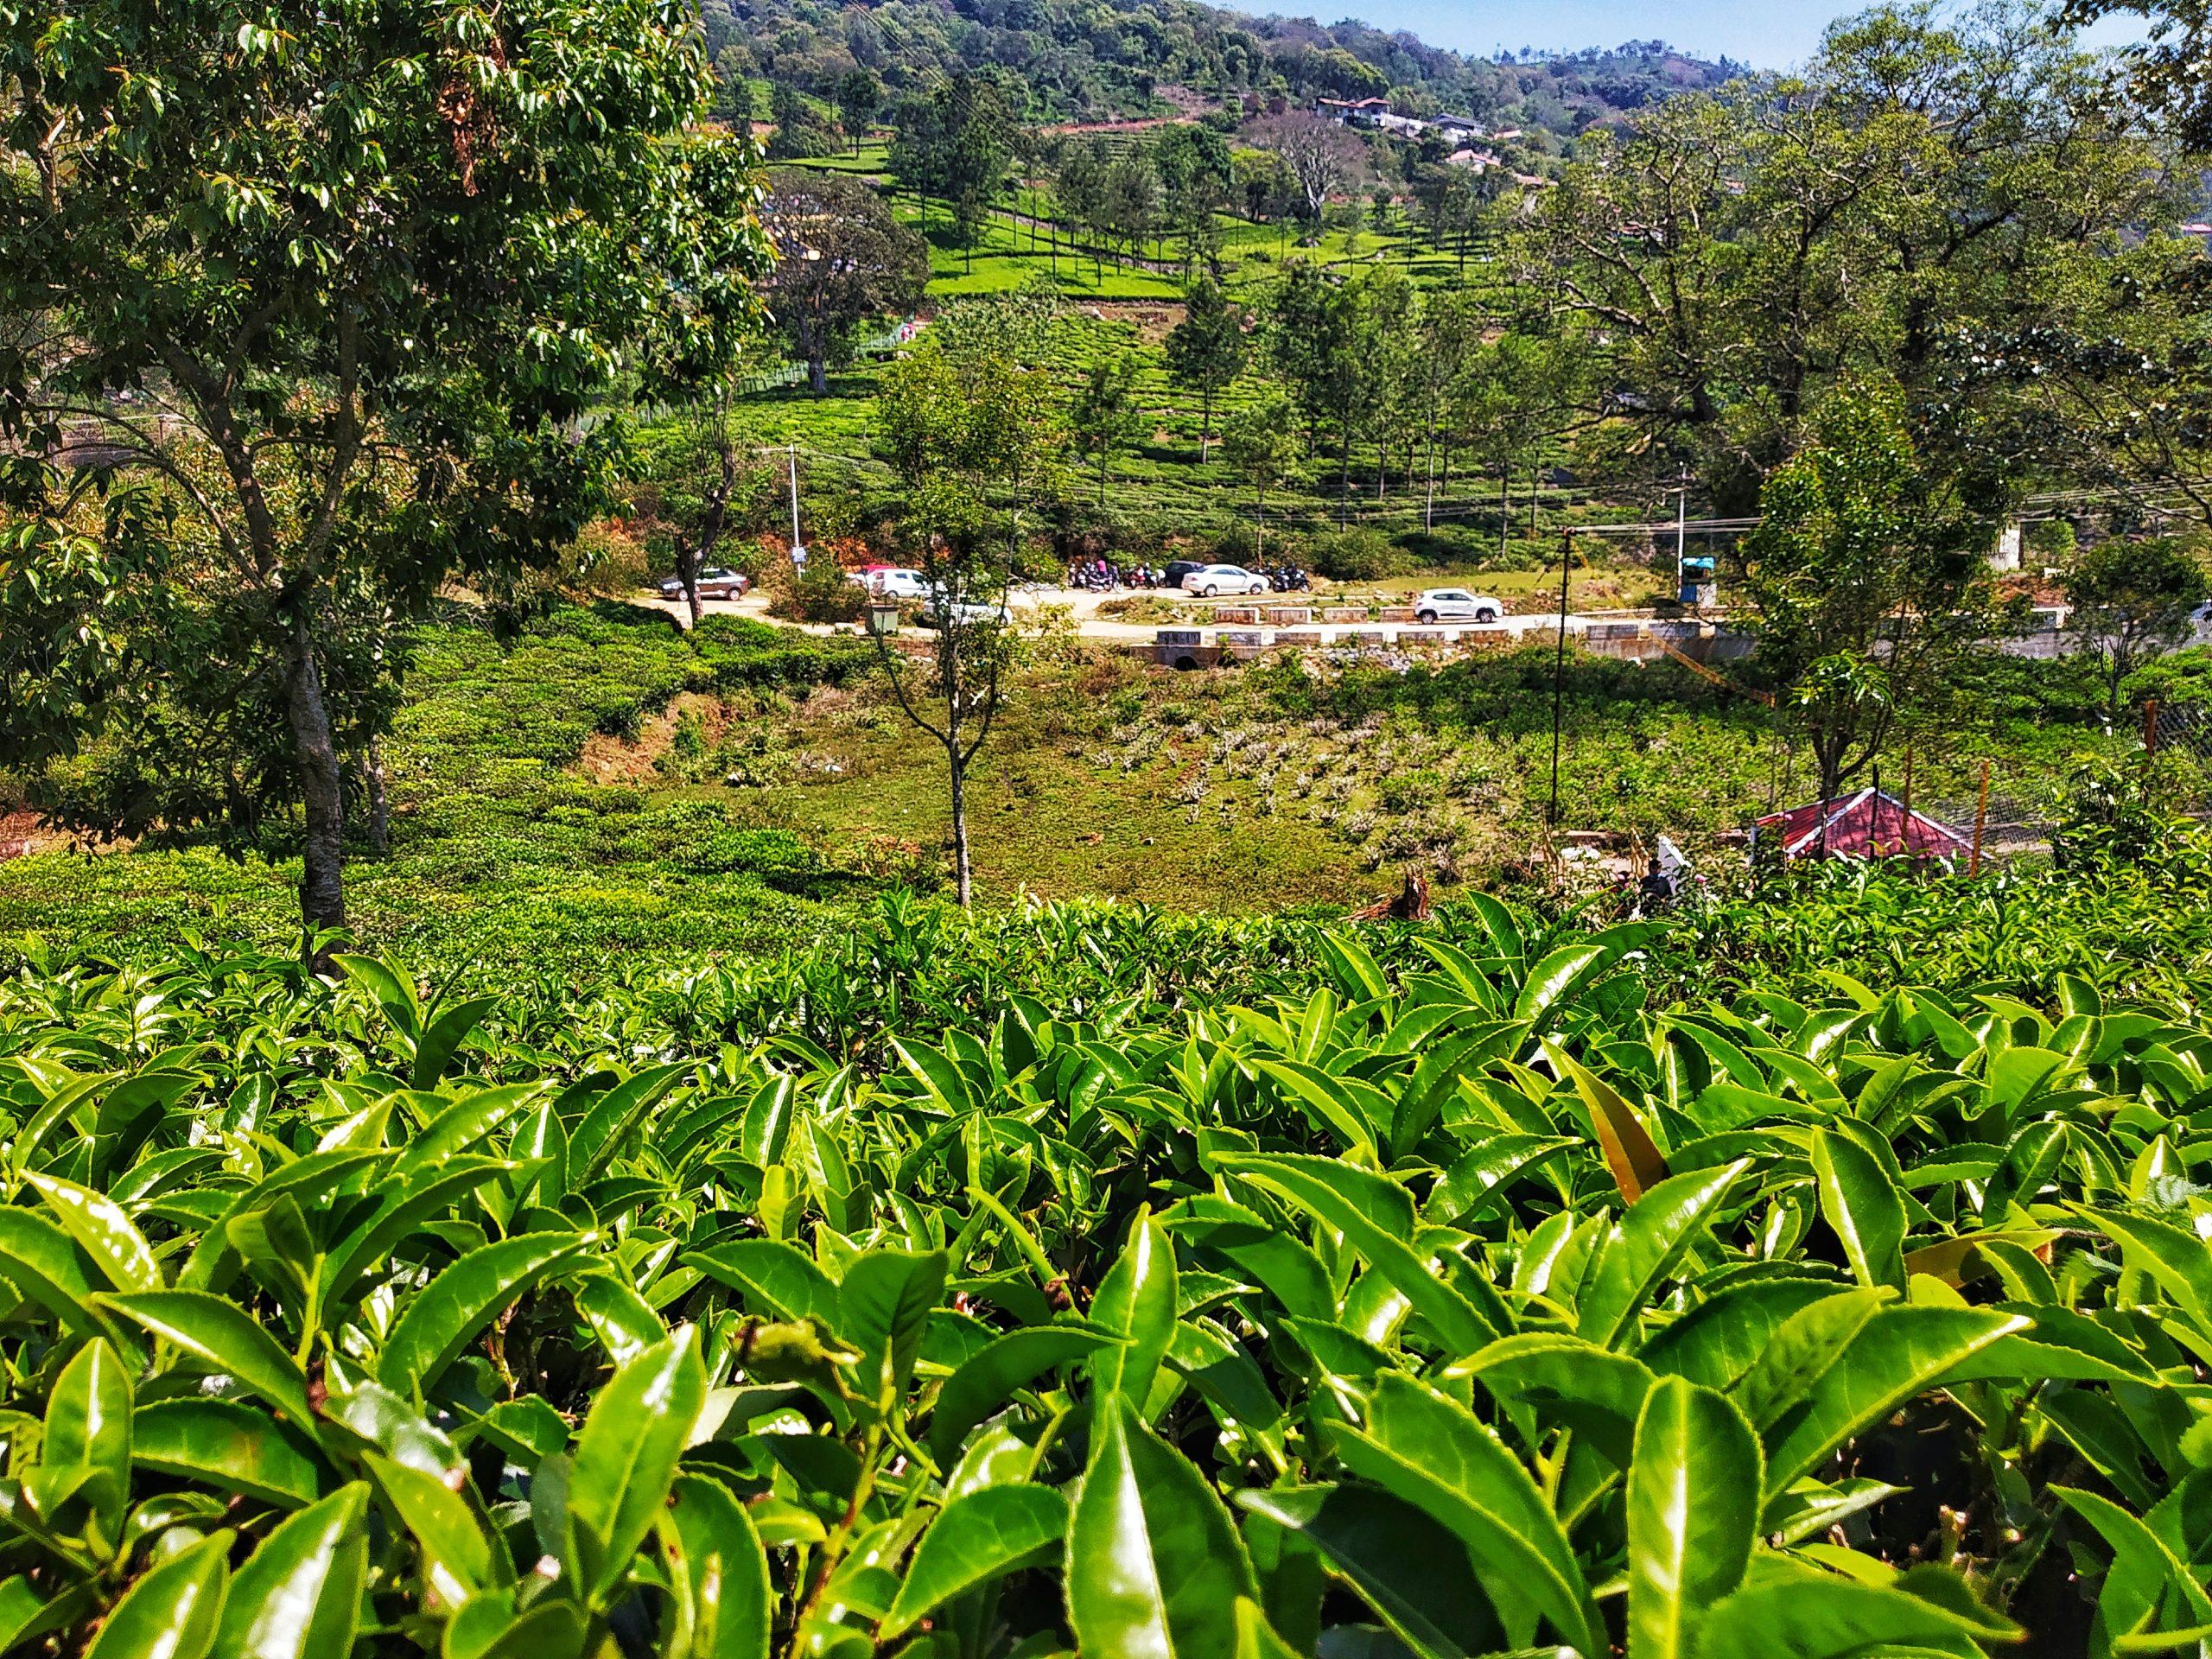 A tea garden in Kothagiri